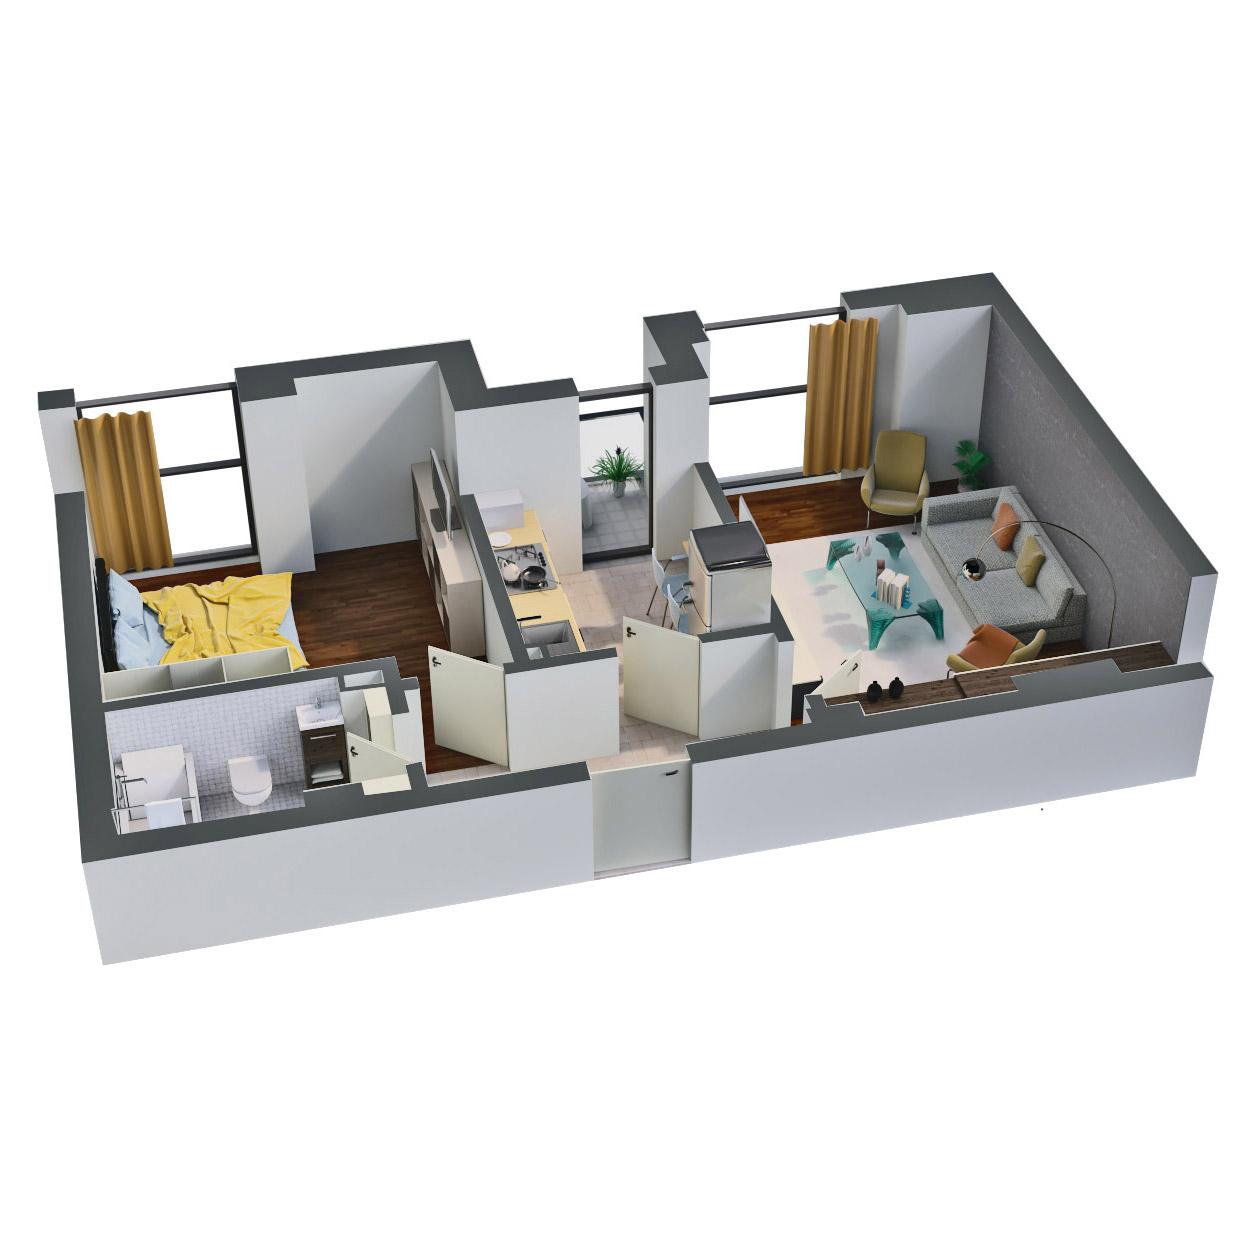 Apartament 2 camere de vanzare Bucuresti - Catedral Residence - Marriott, Piata Unirii, 13 Septembrie, Izvor - Tip 1 - T2A - D